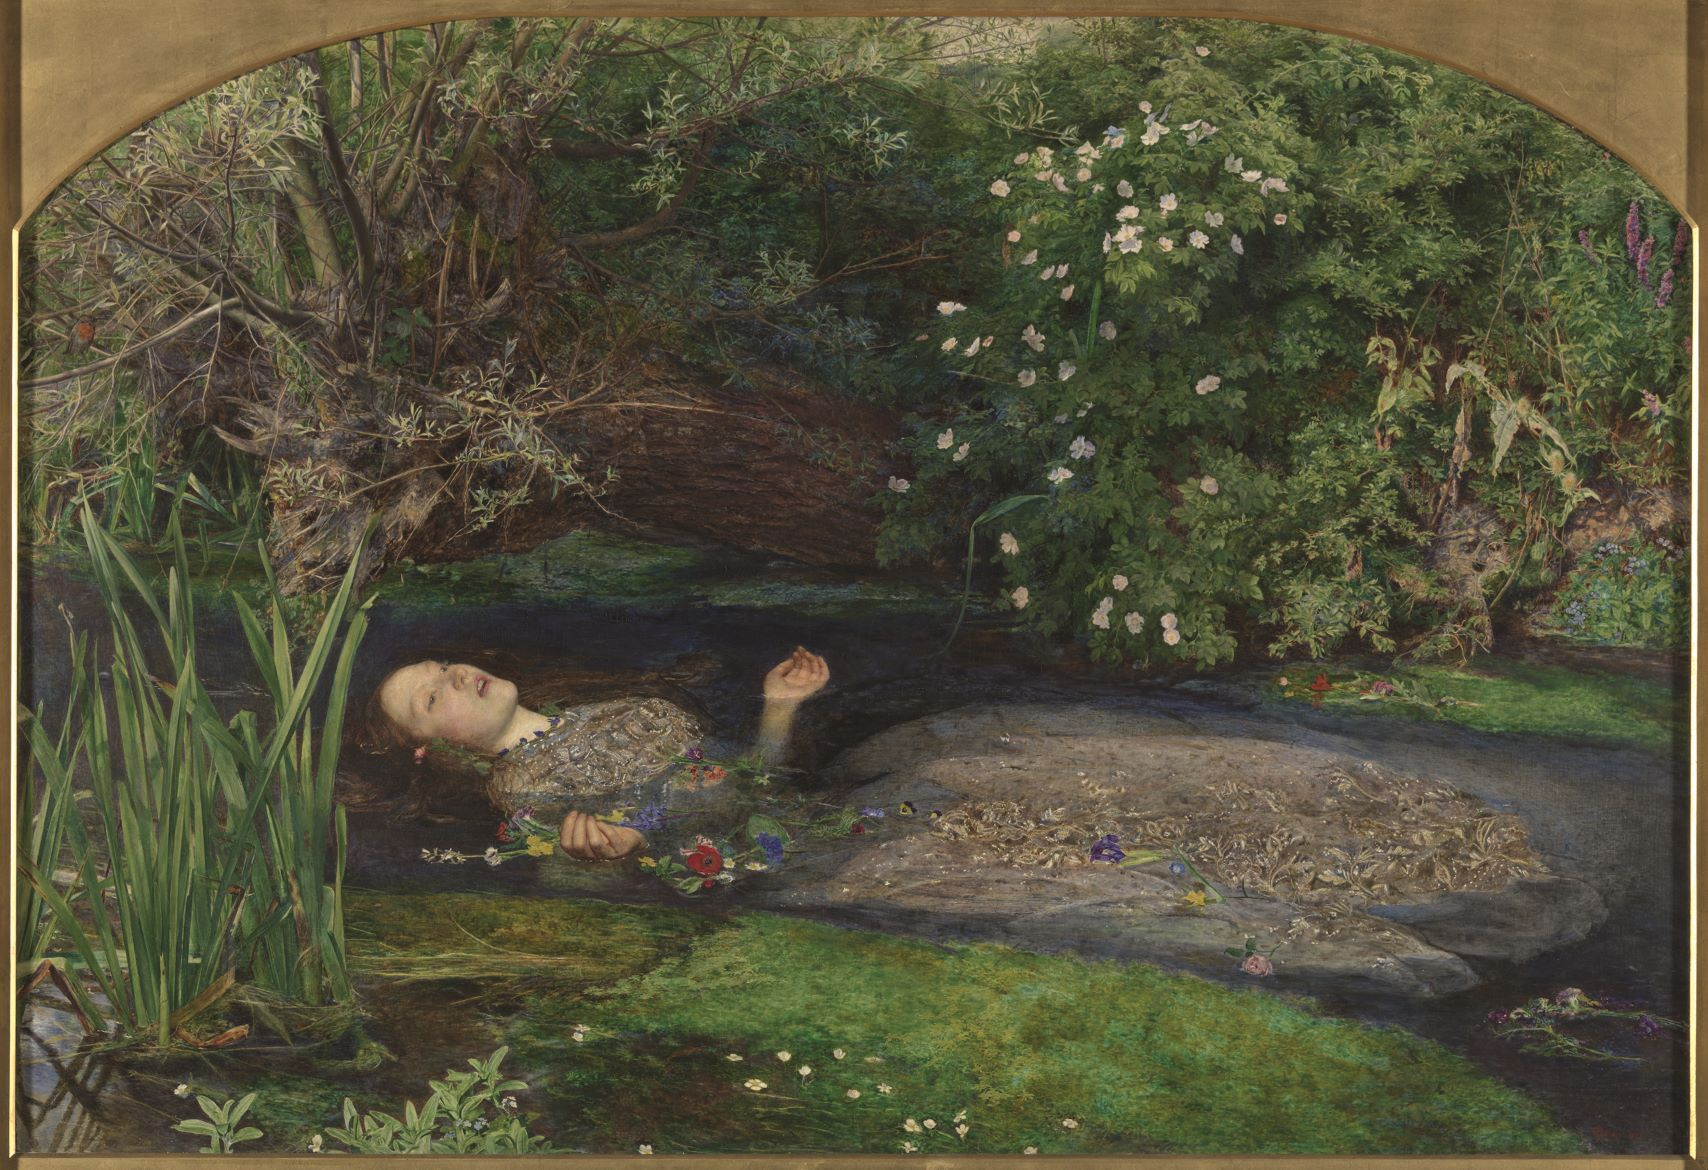 John Everett Millais, Ophelia, 1851-1852, Tate